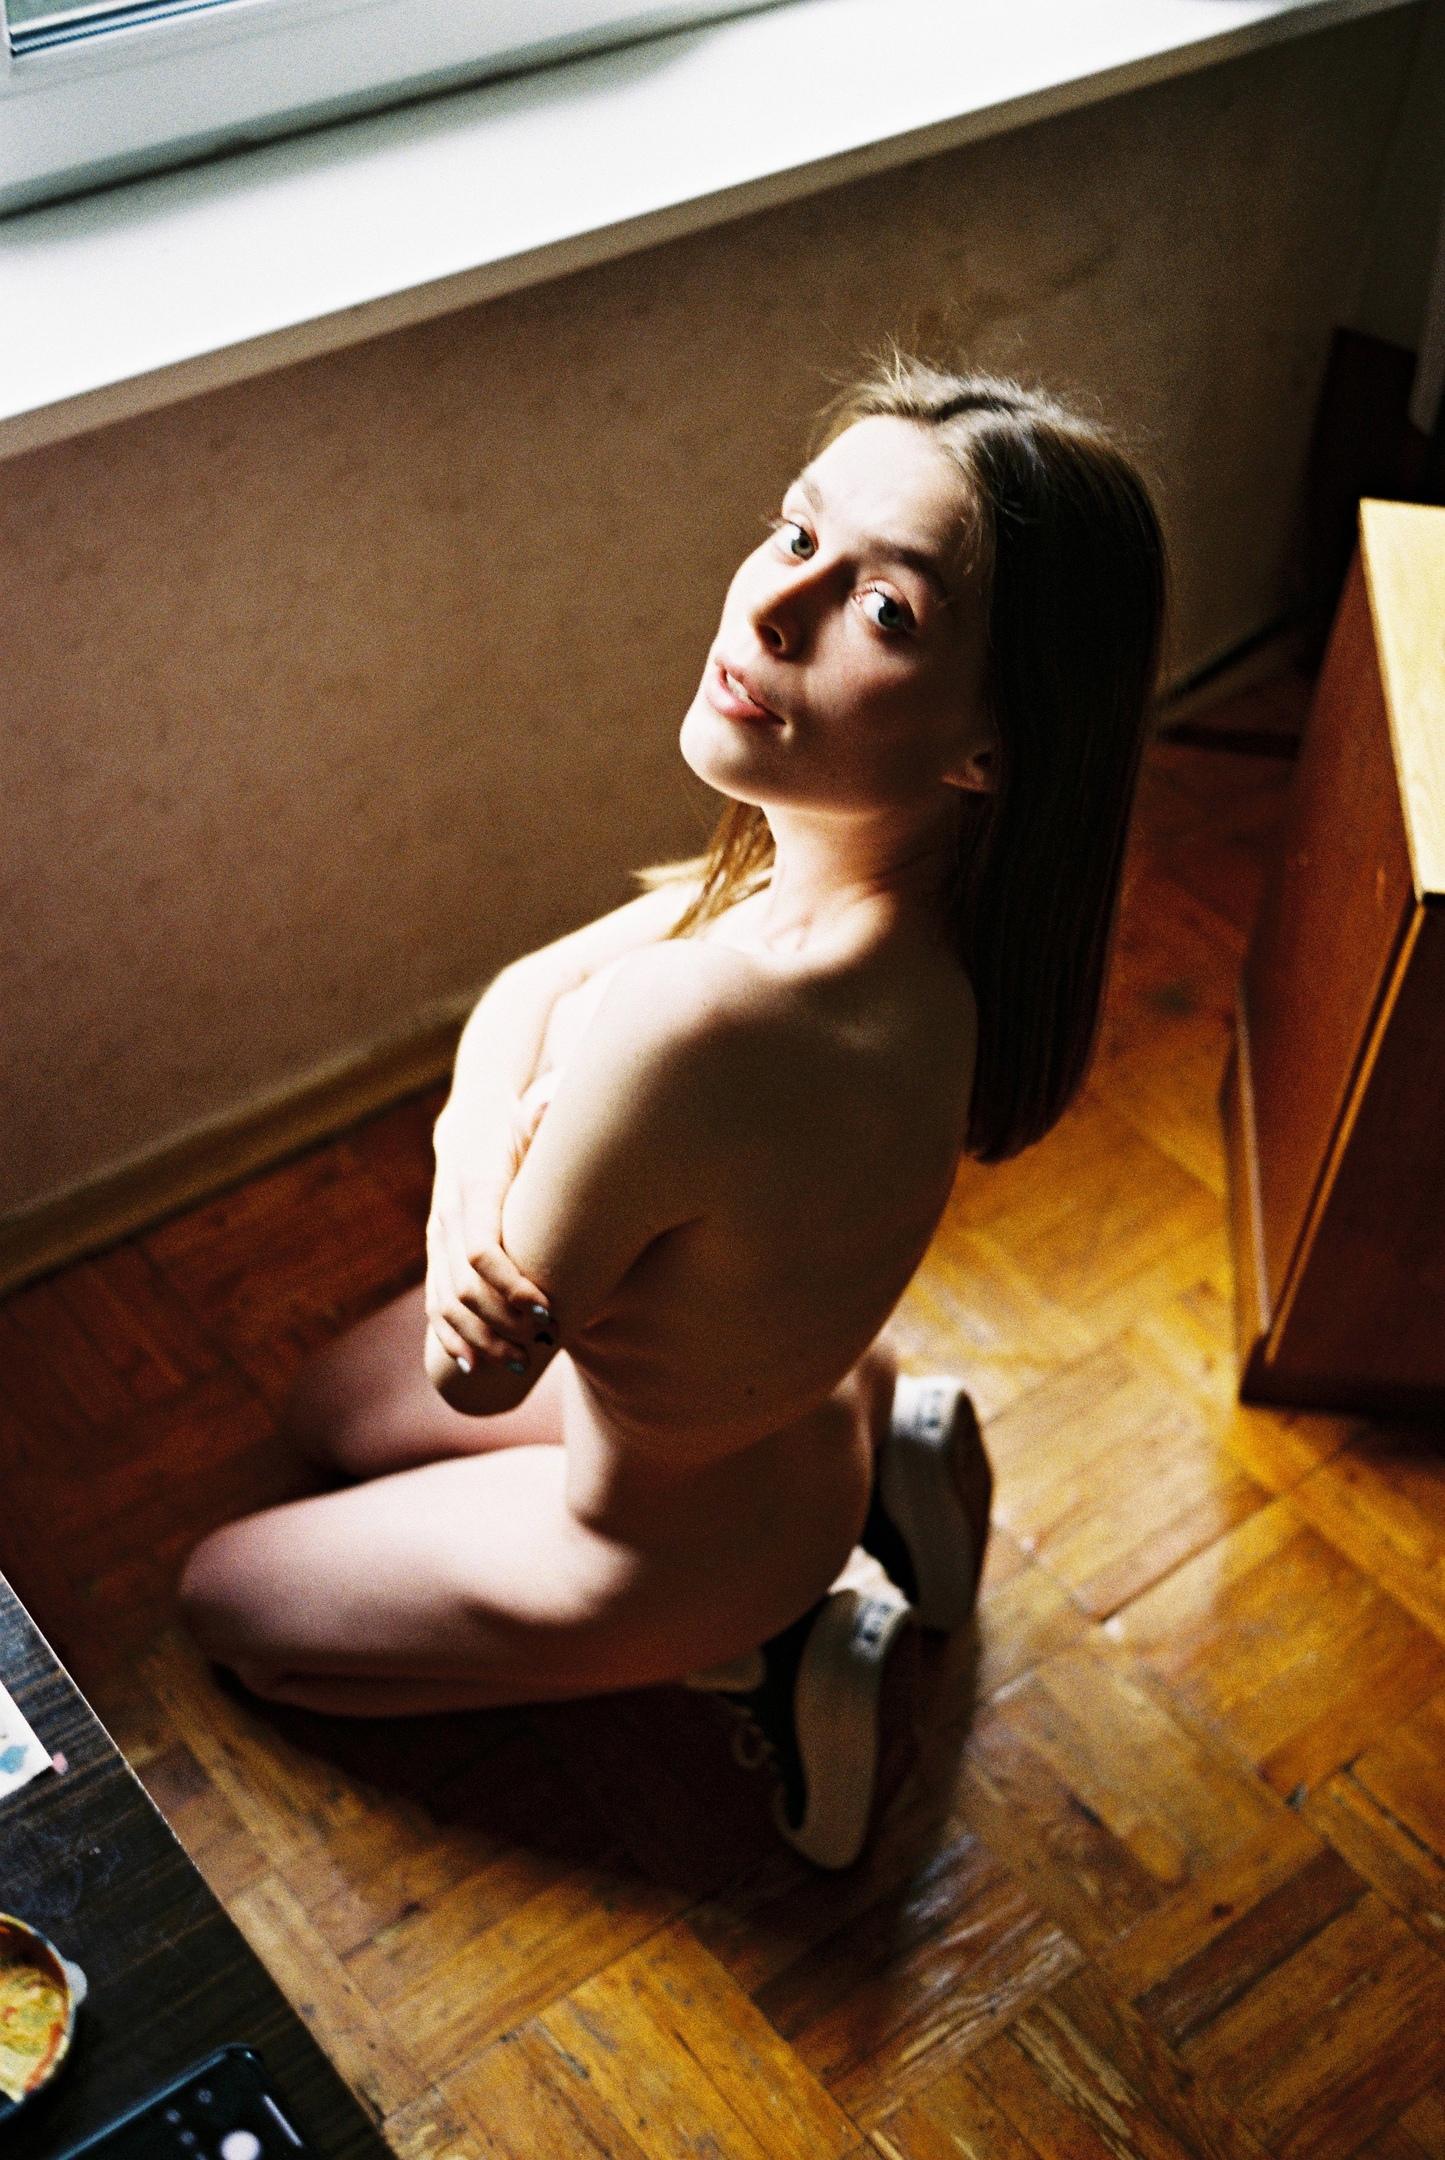 https://www.youngfolks.ru/pub/photographer-dmitriy-kaygorodov-113022